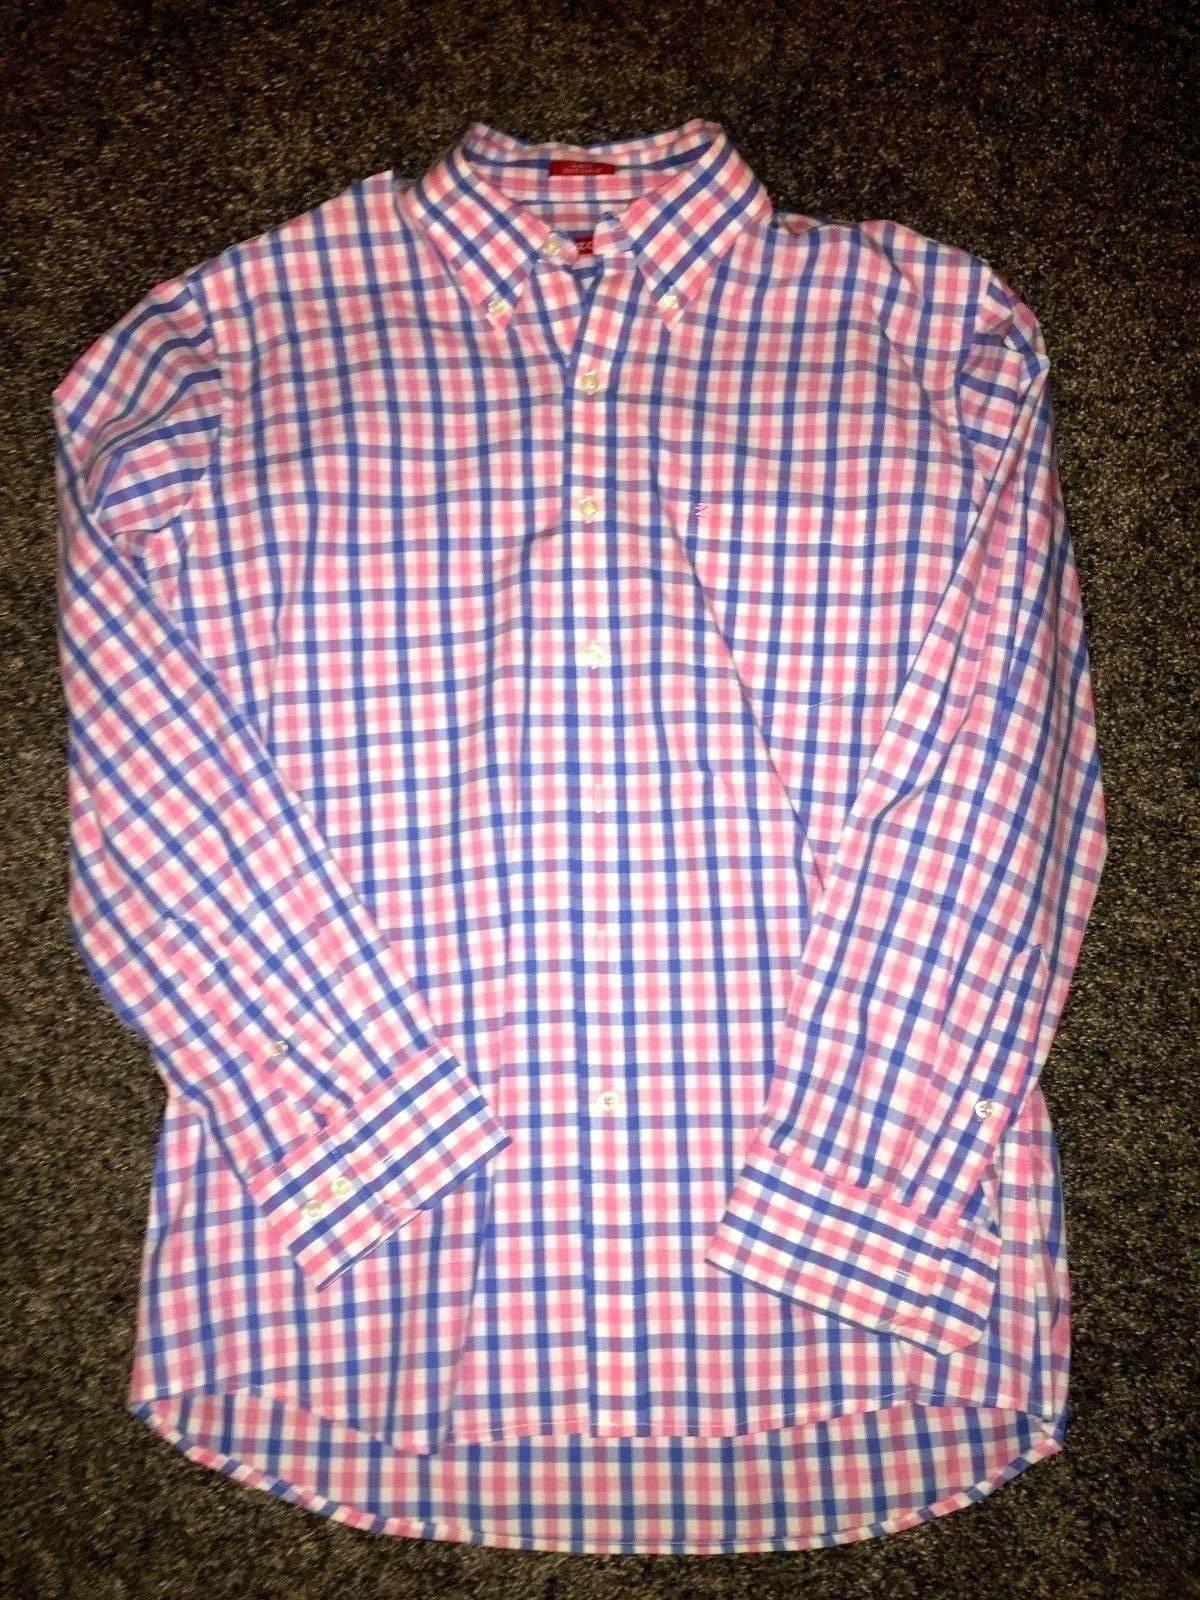 Izod Izod Check Pinkblue Cotton Oxford Shirt Slim Fit Size L